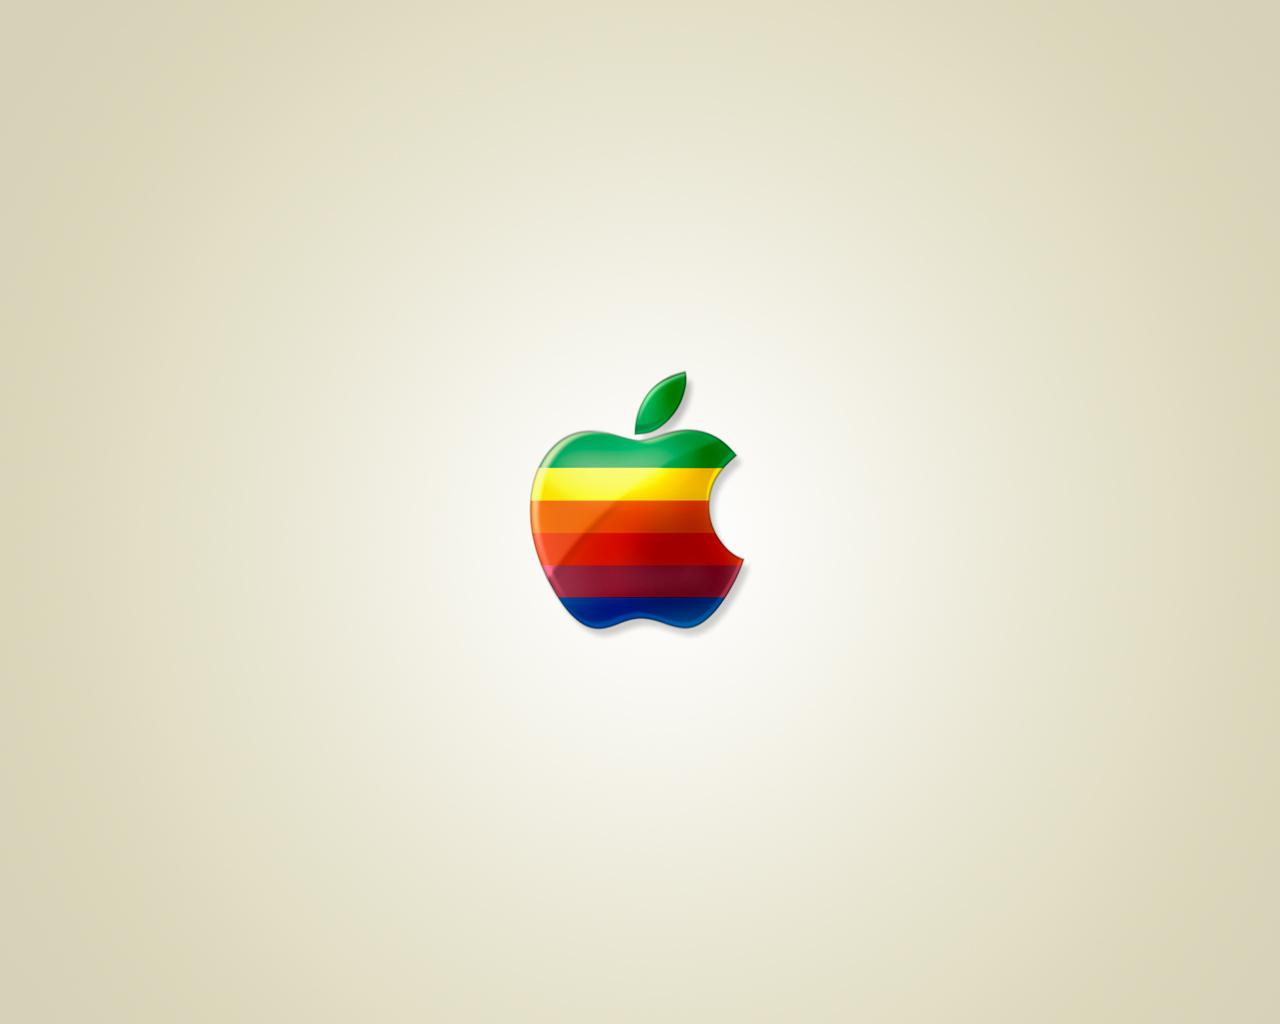 Retro Cars Apple Forum Diegocadorin Lofiversion 149866 Wallpaper wallpaper